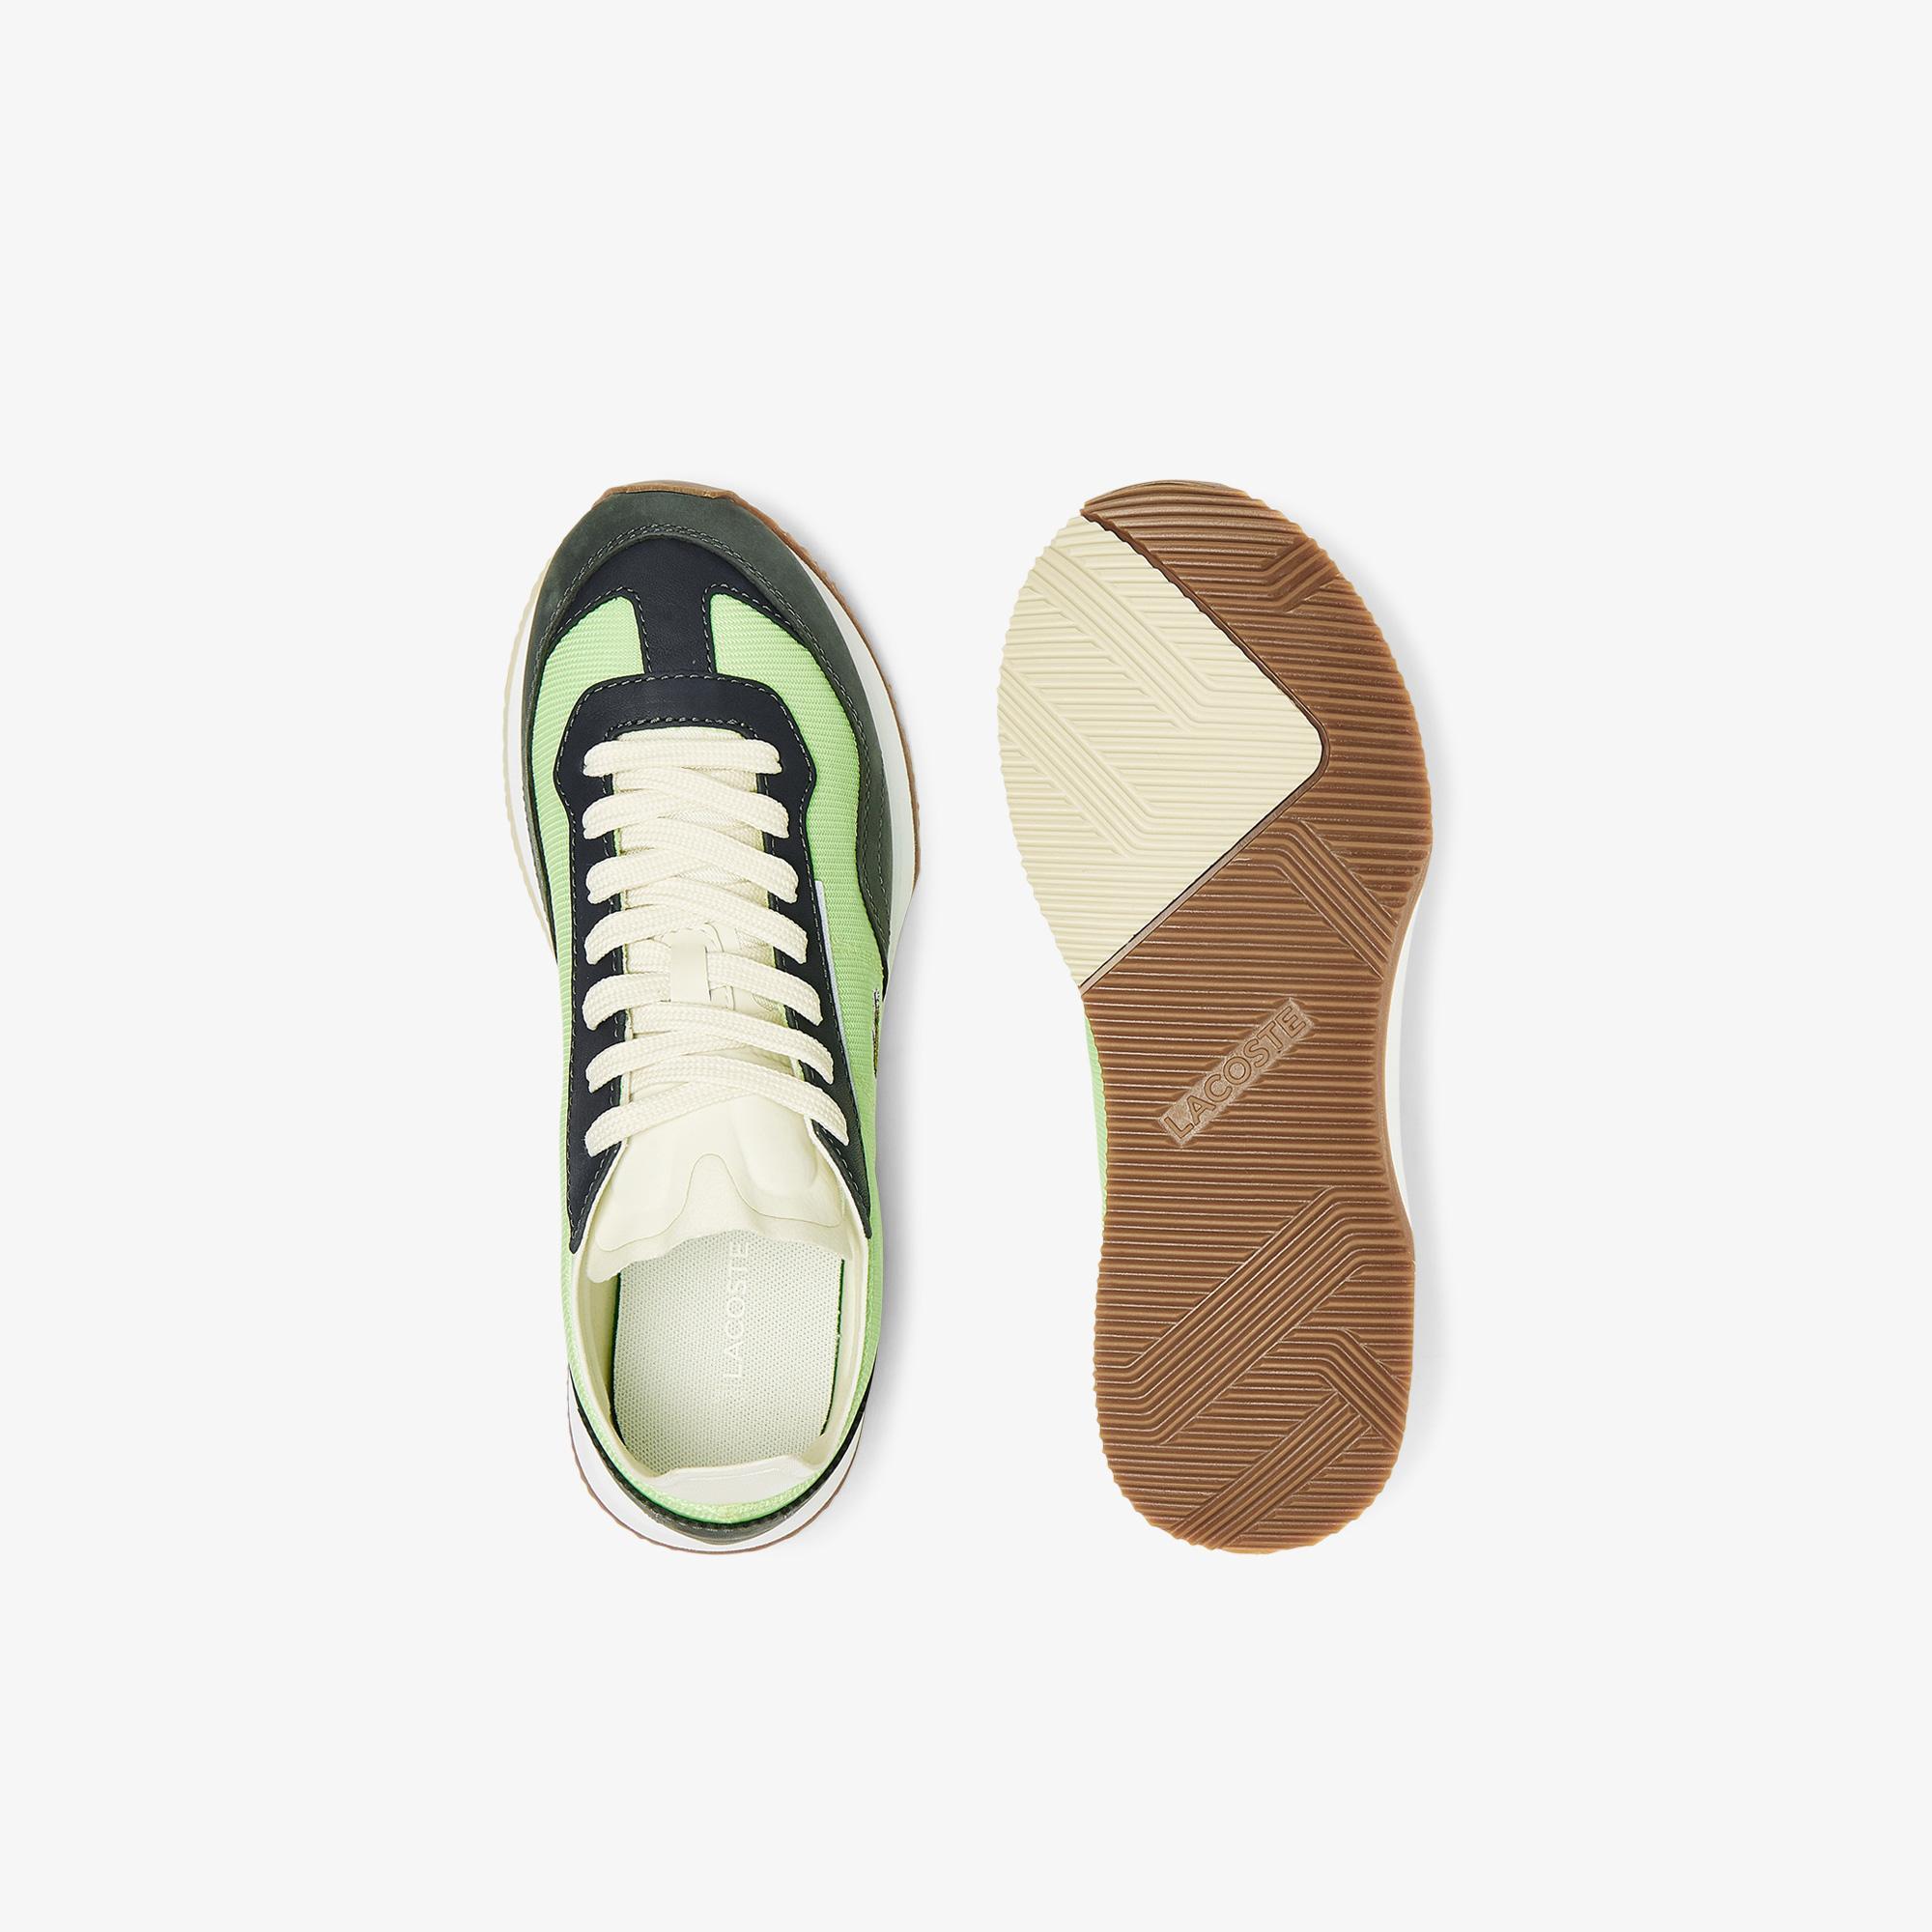 Lacoste Erkek Match Break 0721 1 G Sma Renkli Ayakkabı